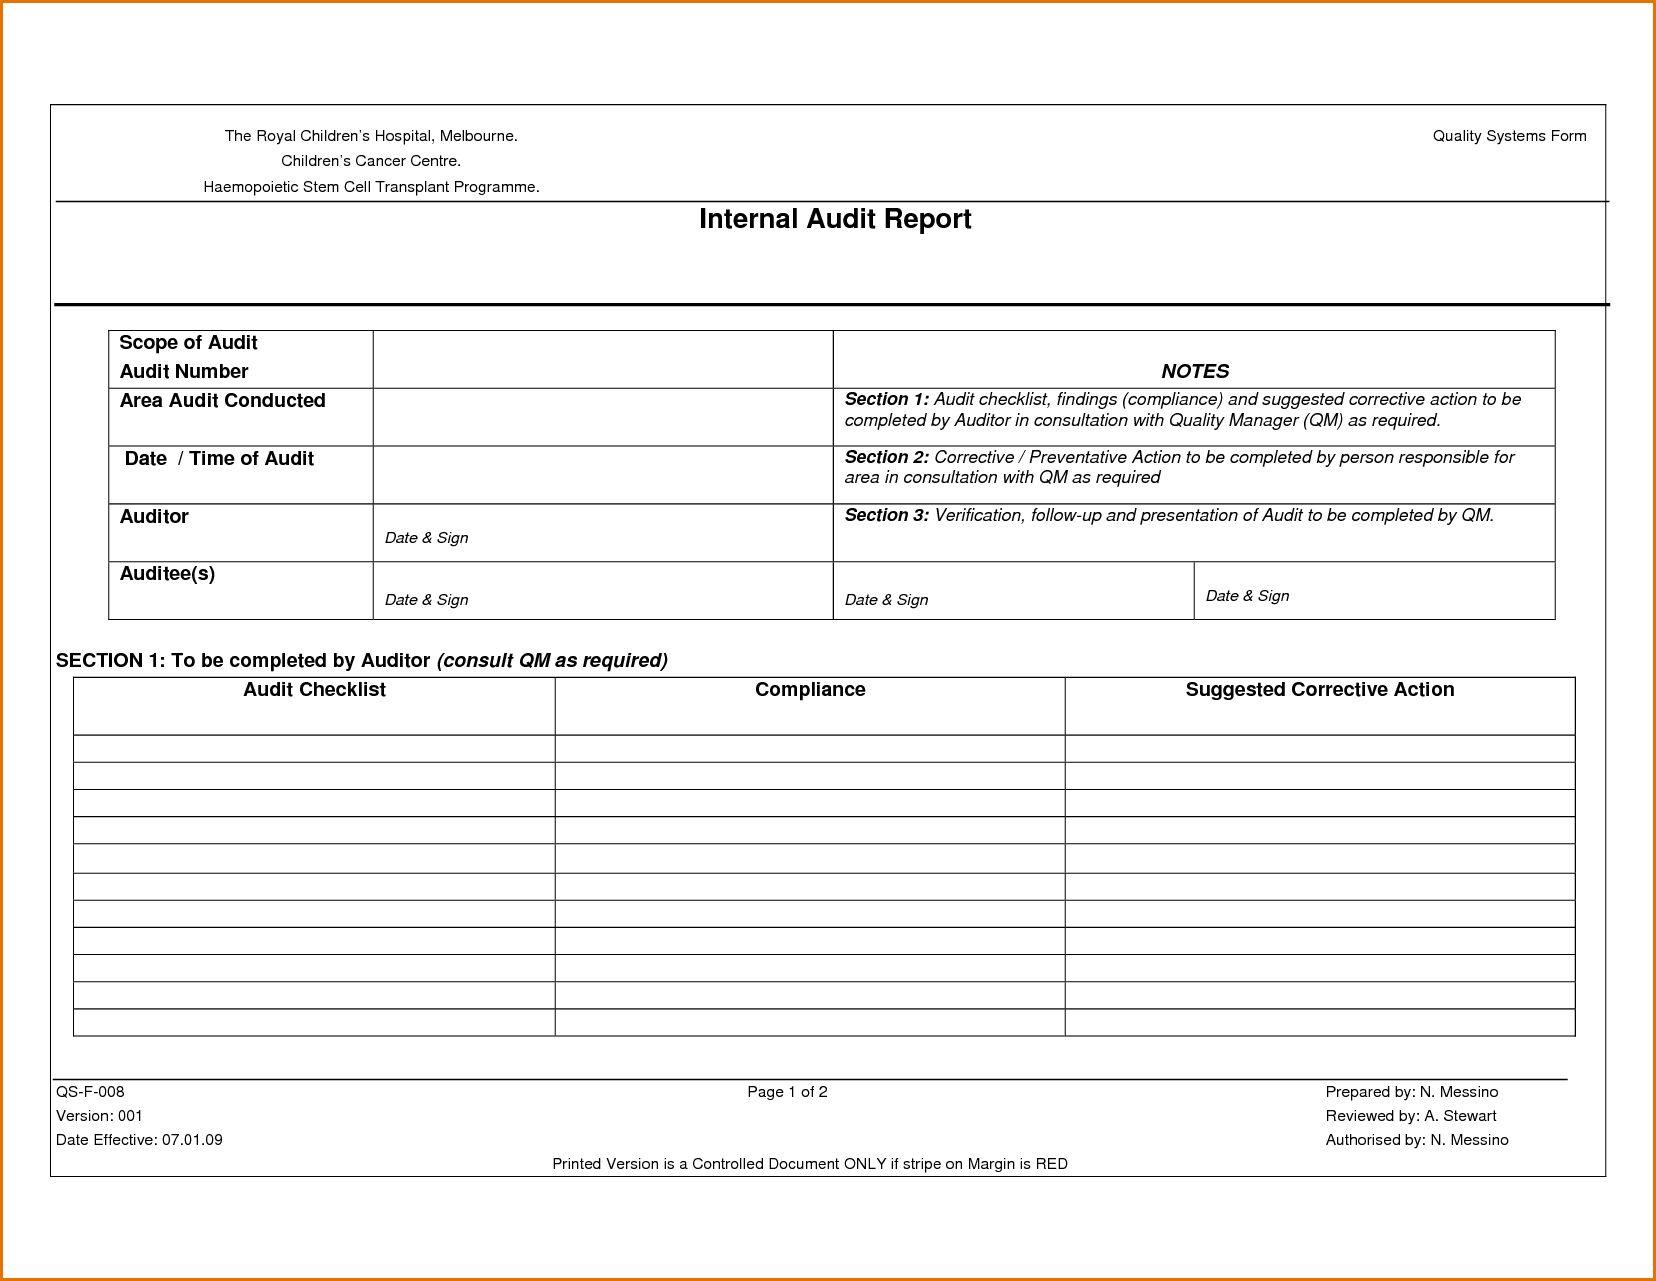 Sample Internal Audit Report Kpmg And Findings Philippines Inside Iso 9001 Internal Audit Report Template Best Template Internal Audit Audit Report Template